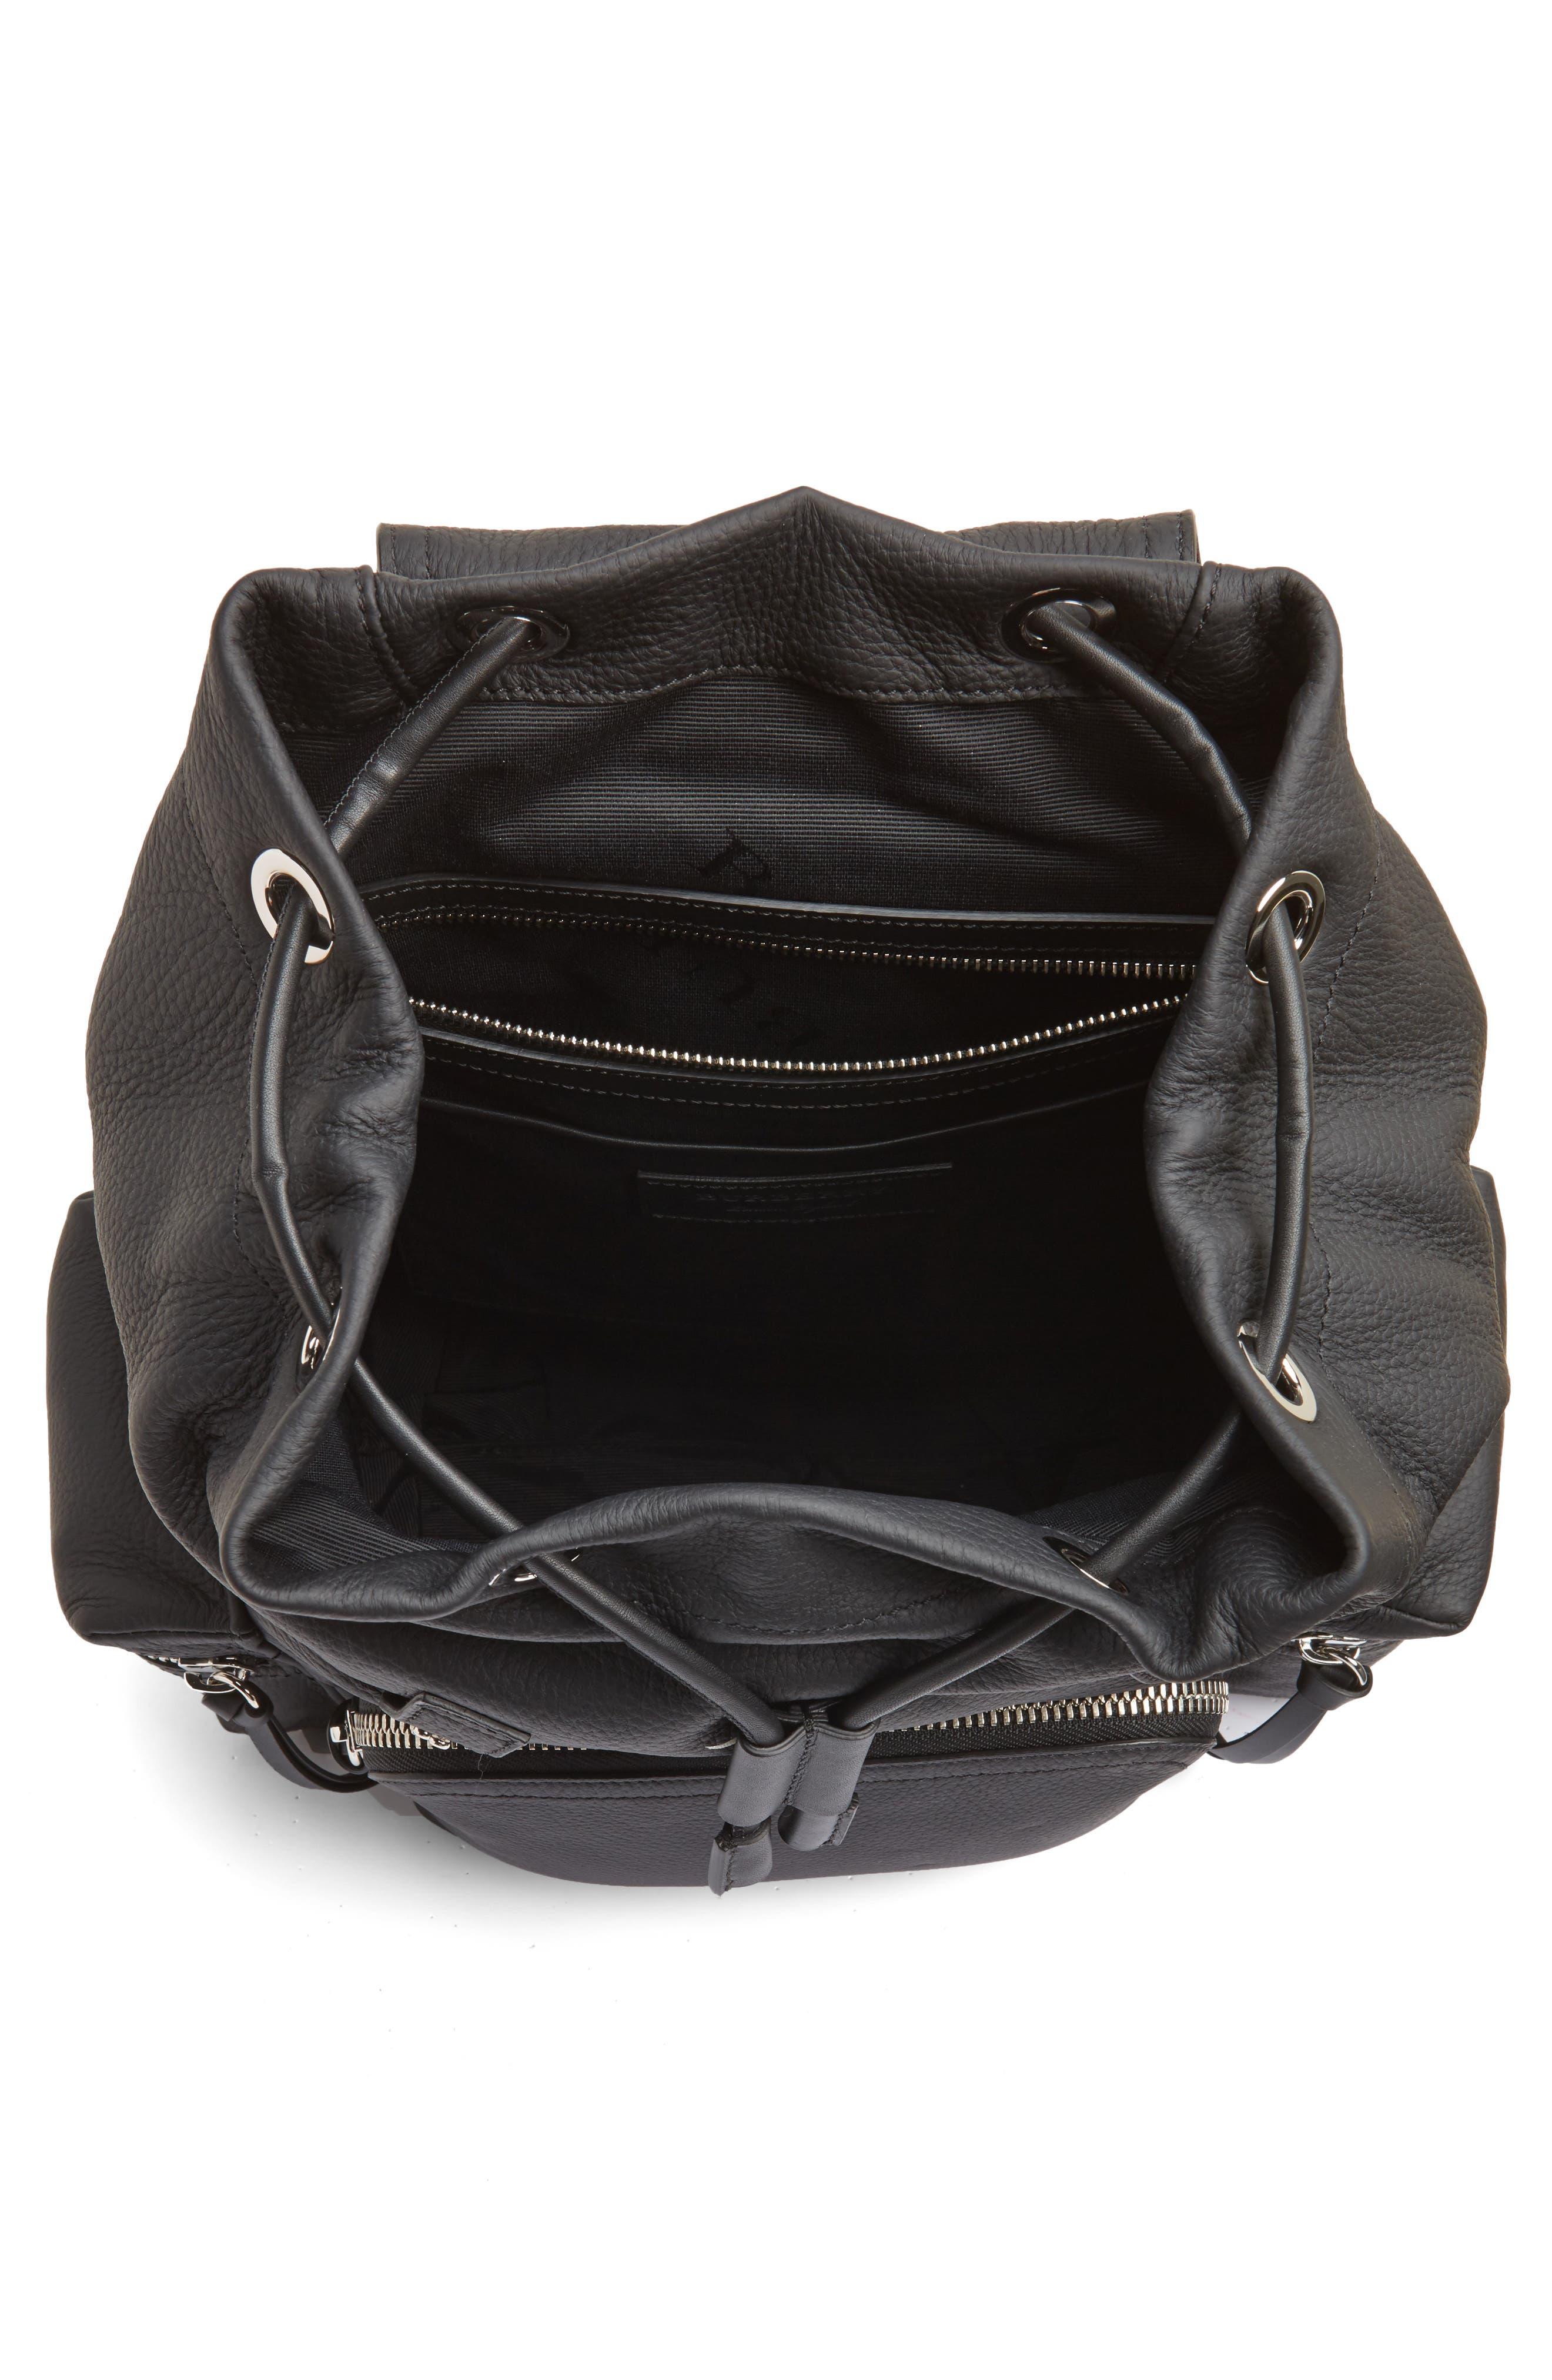 Medium Rucksack Leather Backpack,                             Alternate thumbnail 4, color,